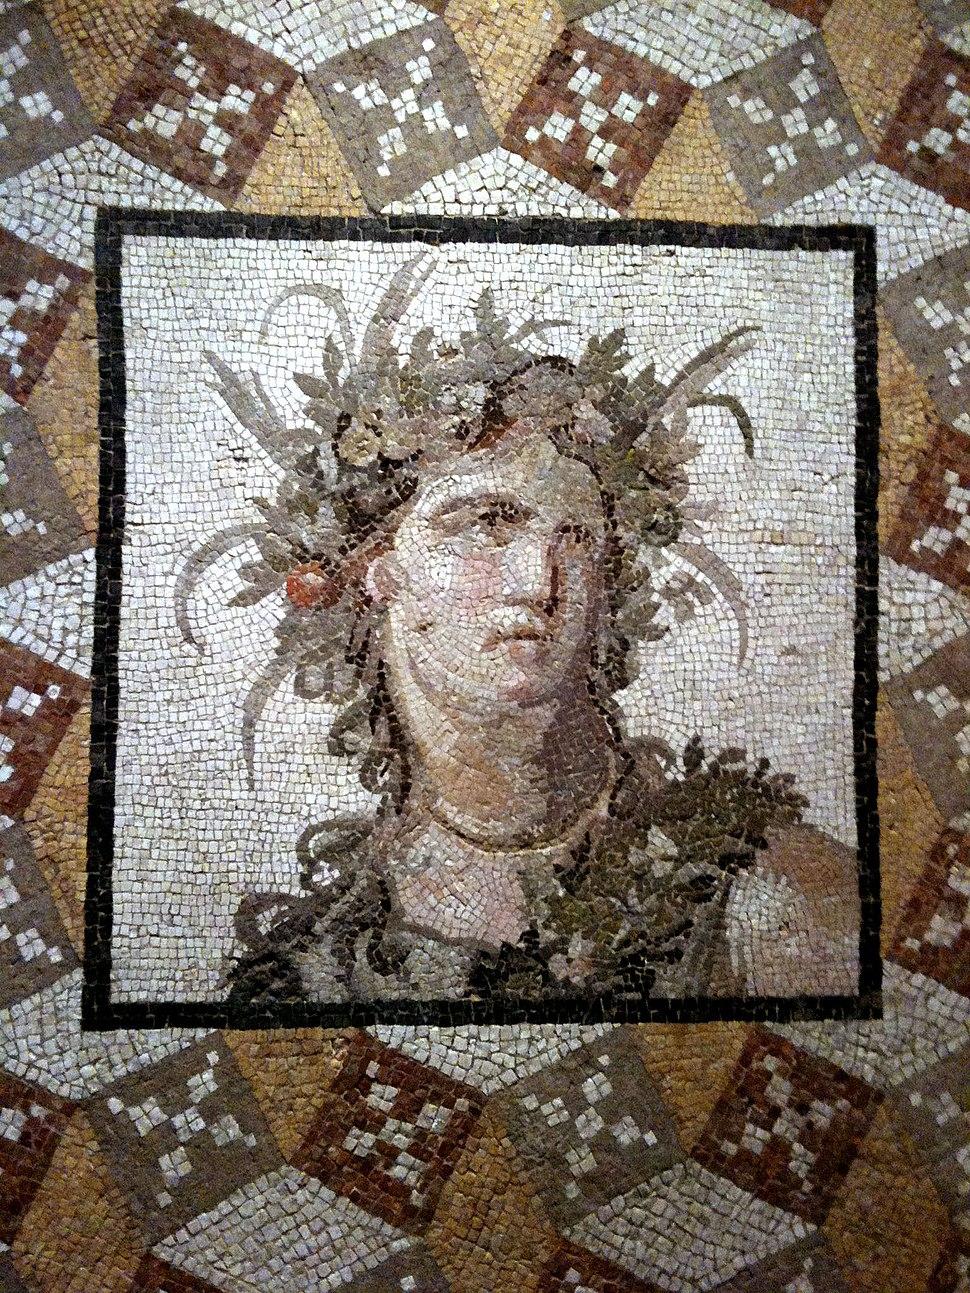 So-called Antioch Mosaic